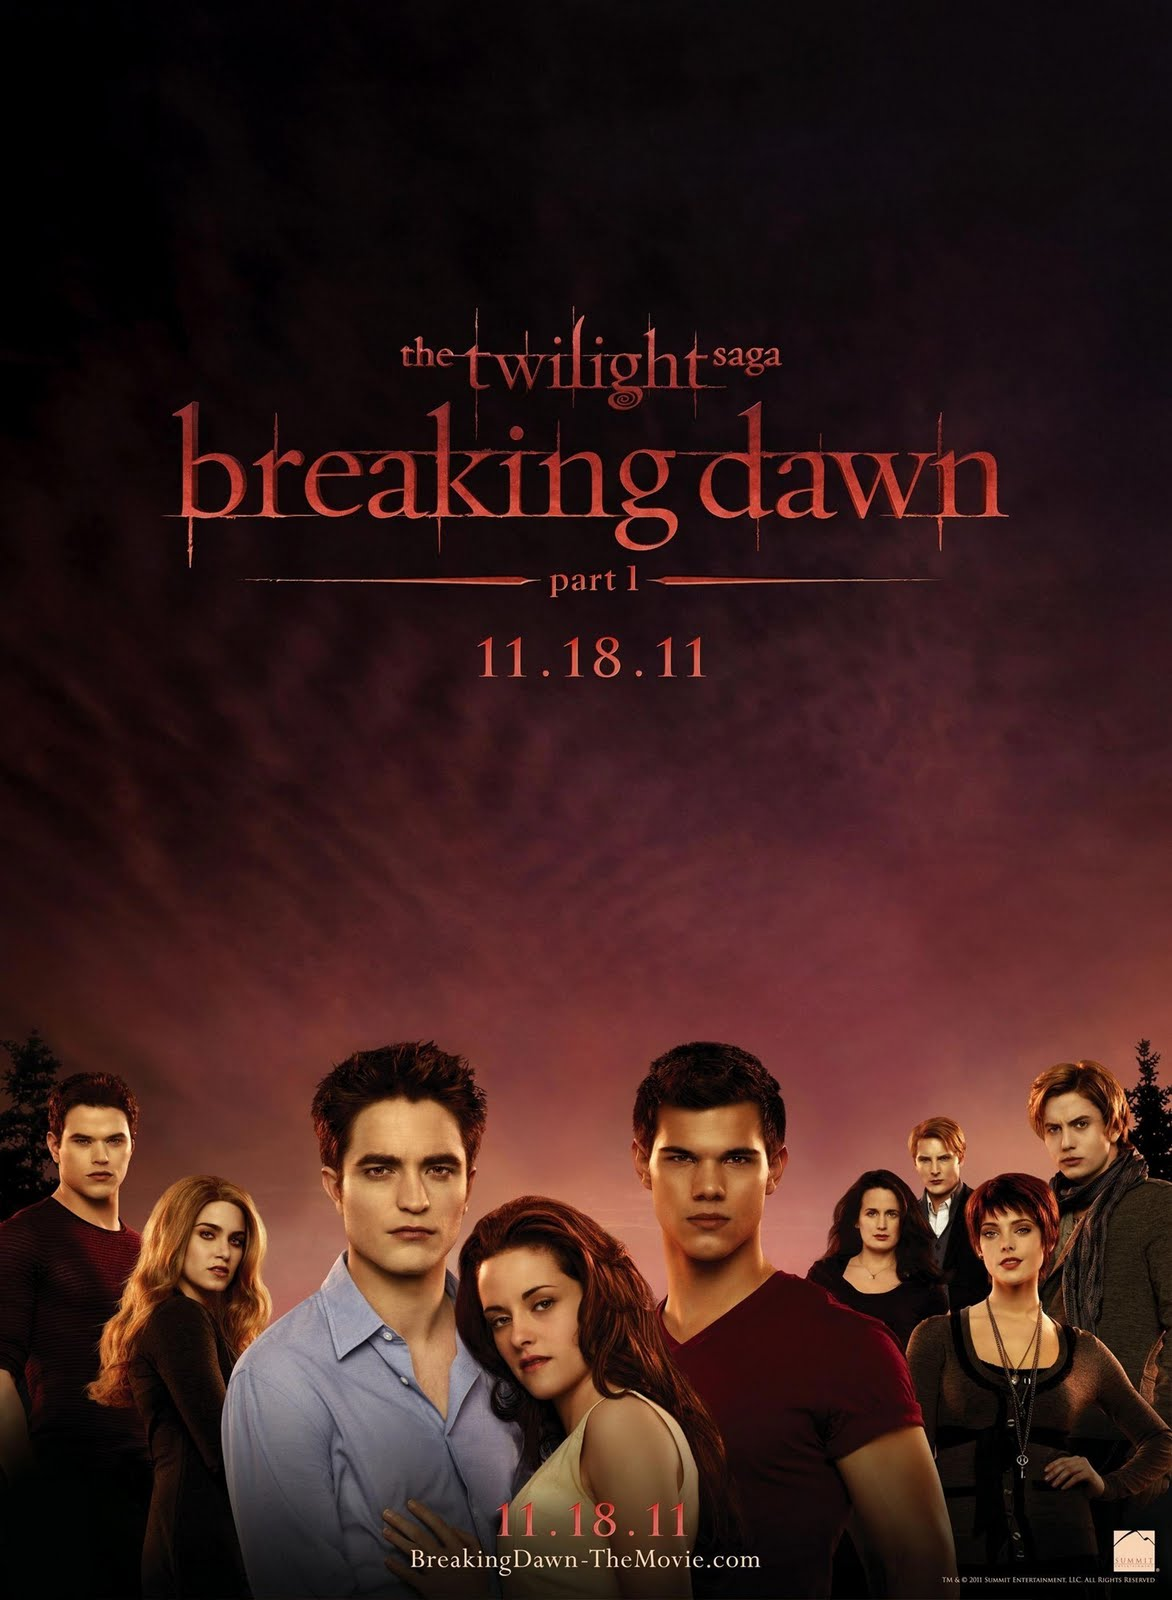 Movies: Posters Of The Twilight Saga: Breaking Dawn